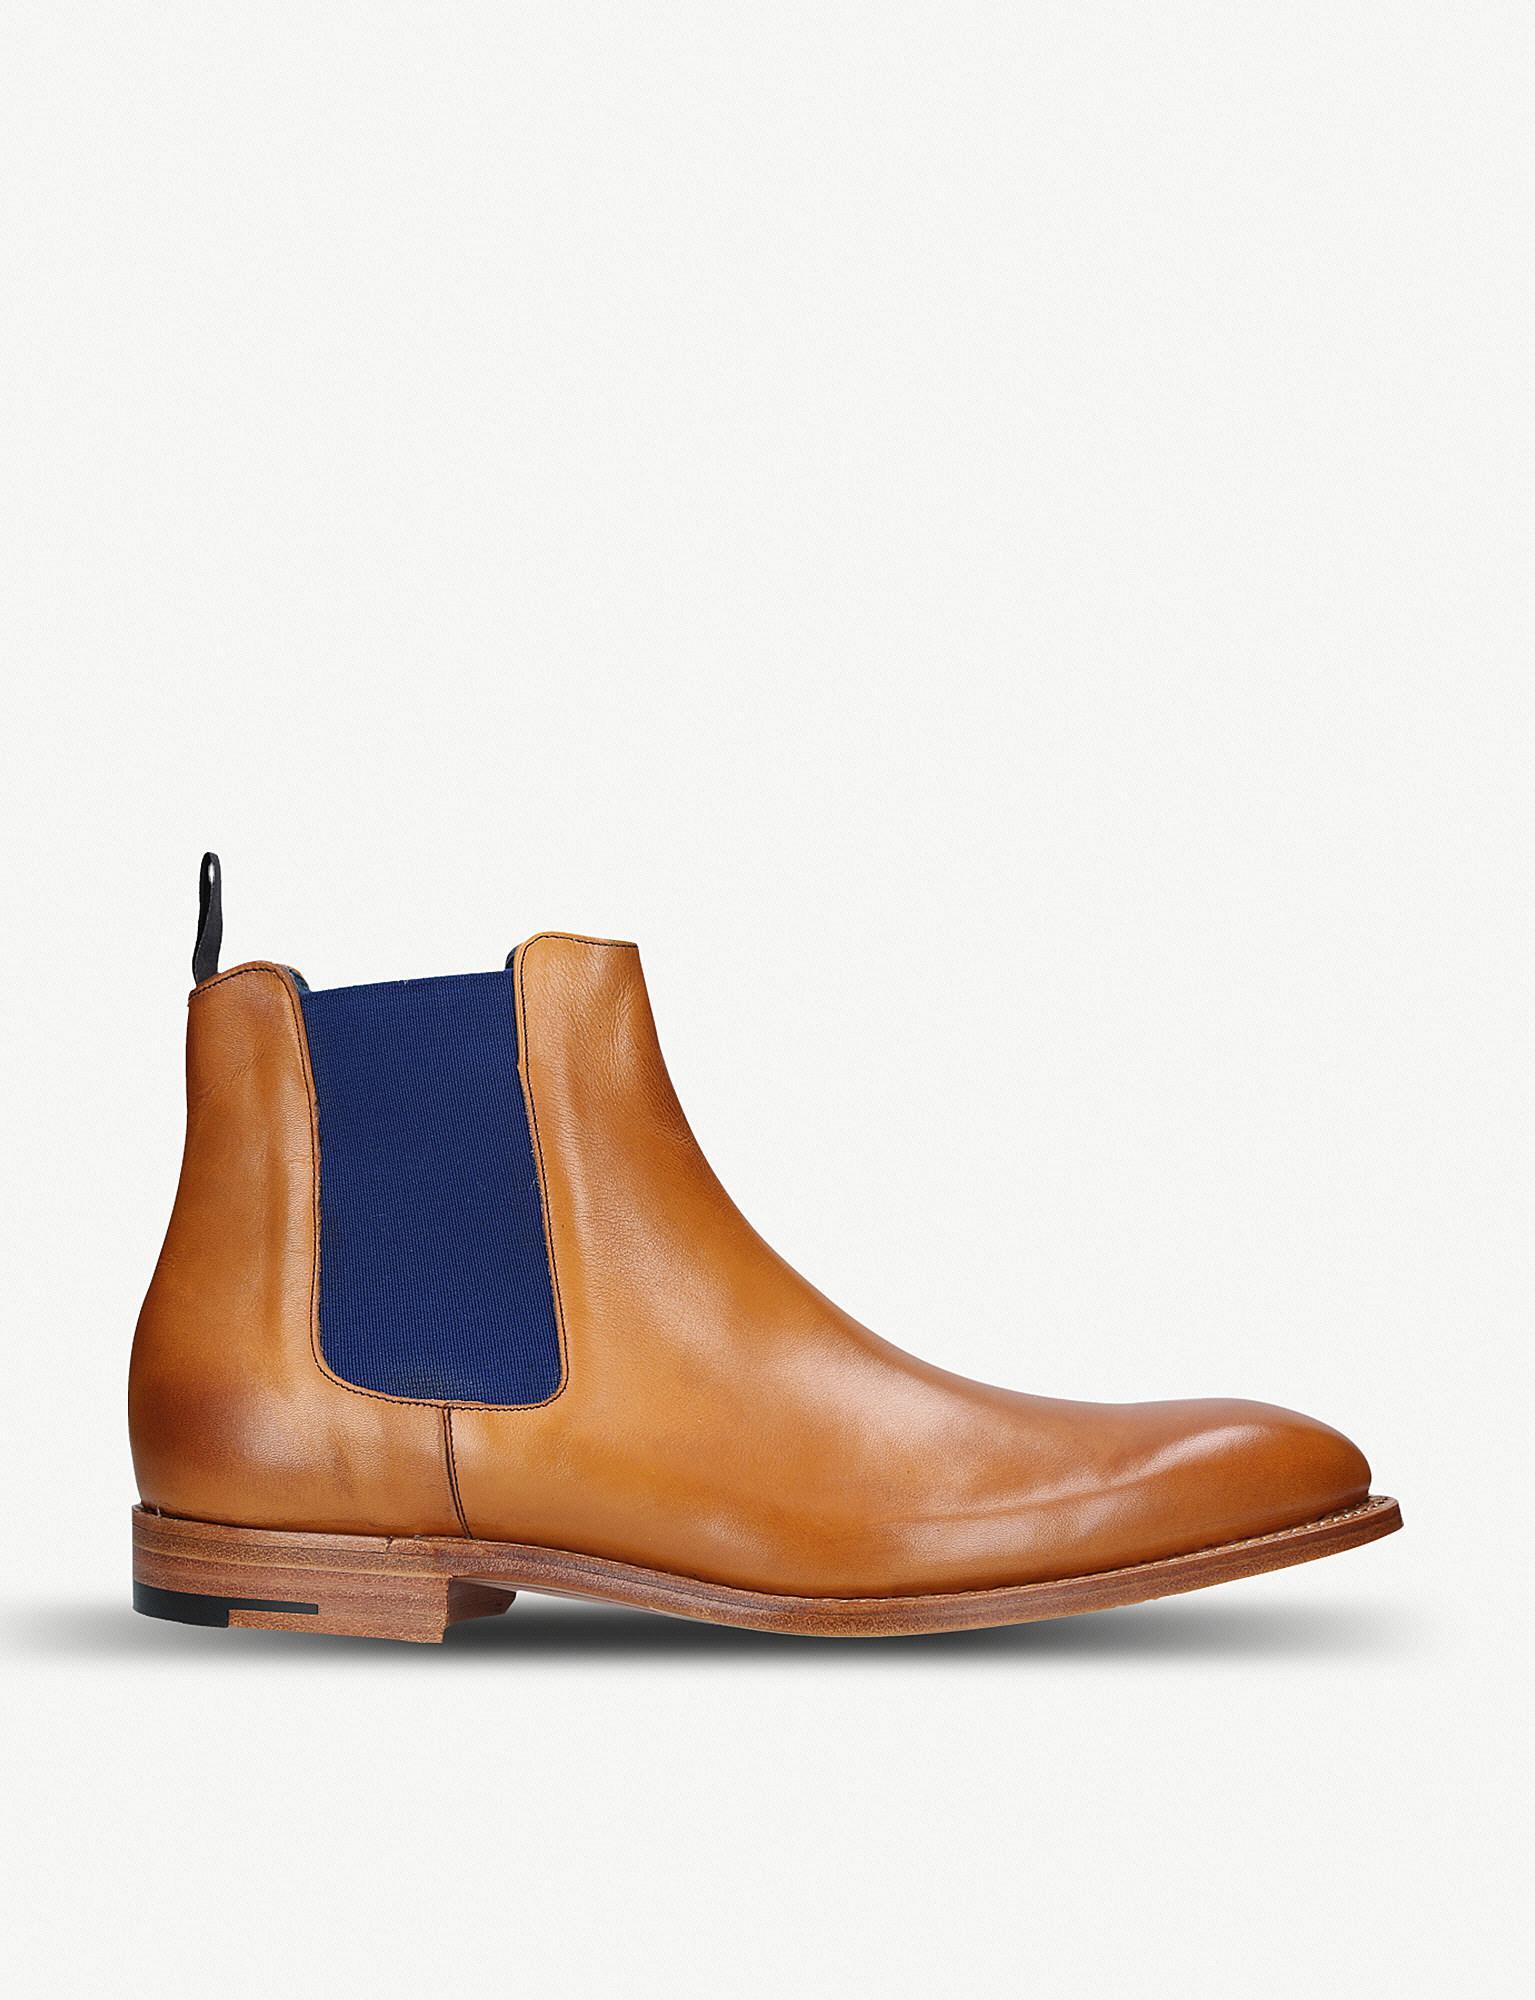 718614bad40 Barker Hopper Leather Chelsea Boots in Brown for Men - Lyst